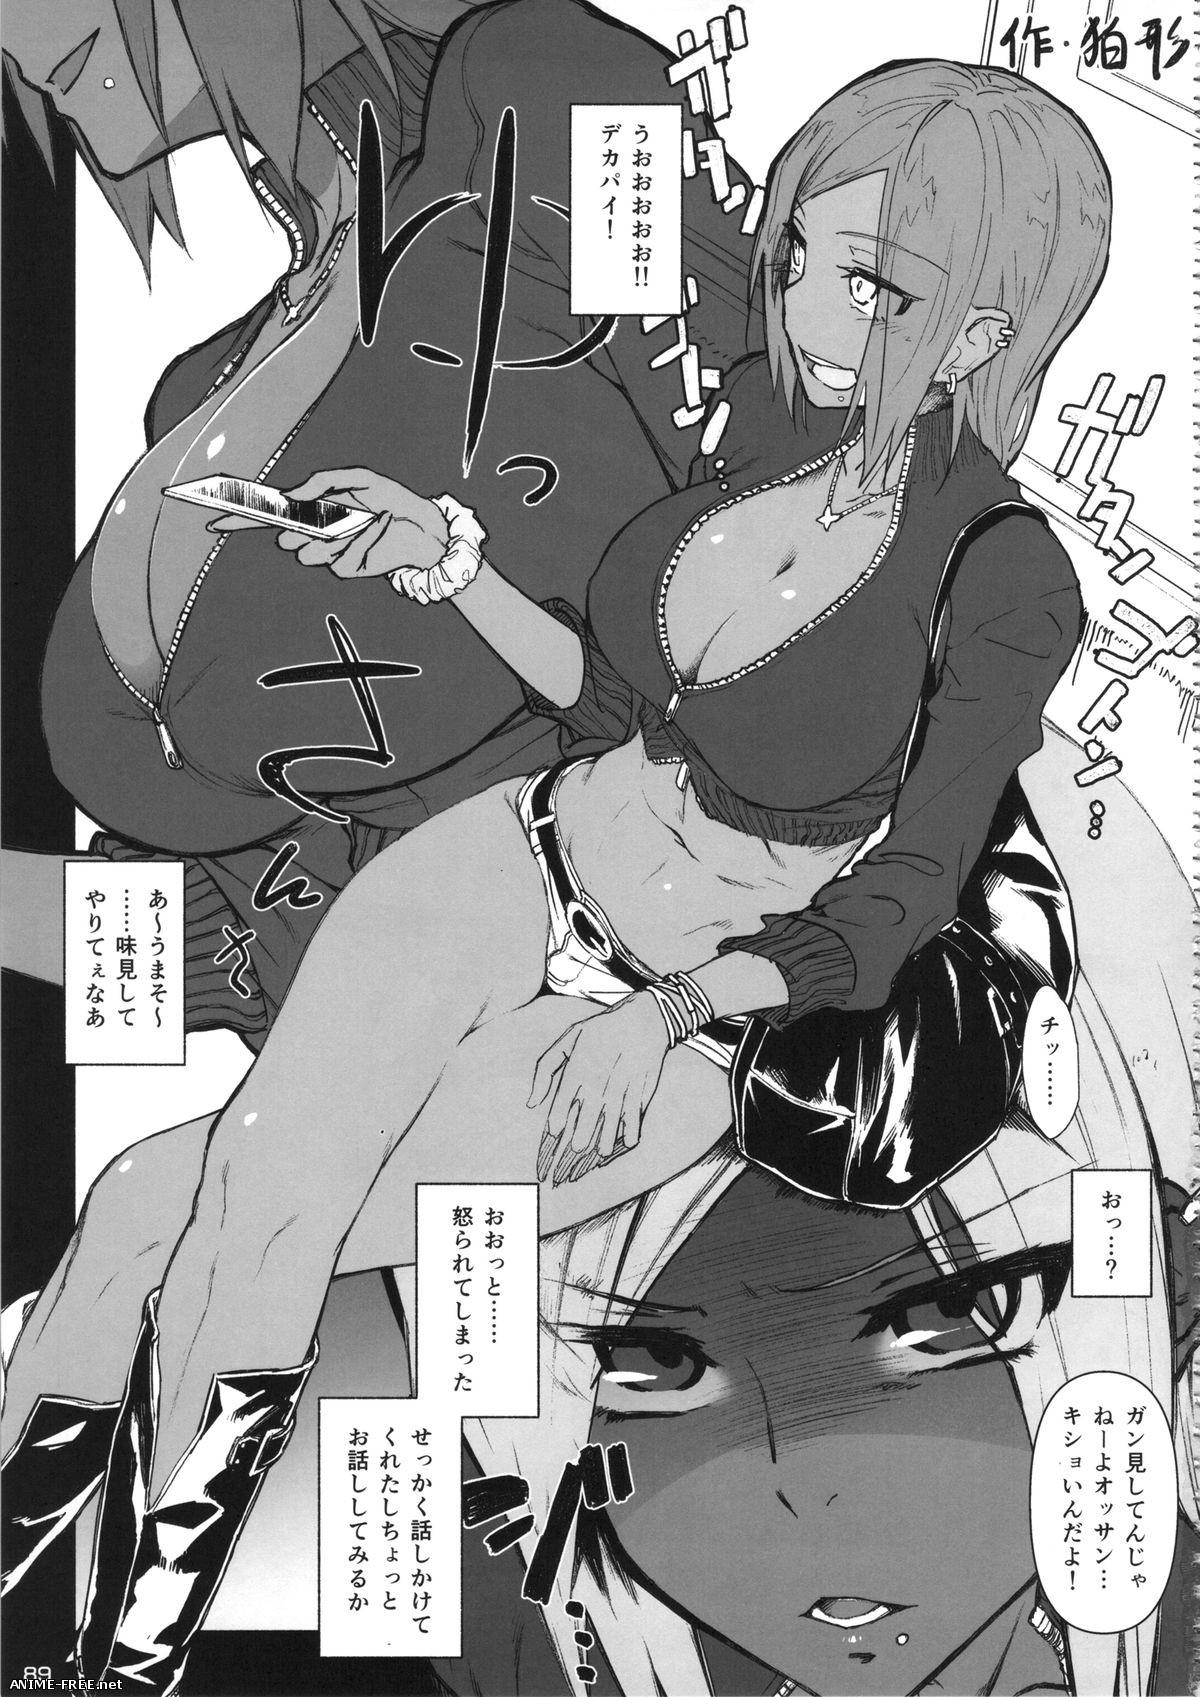 Chinbotsu (Chinbotsu Sunzen) - Сборник хентай манги [Cen] [ENG,JAP] Manga Hentai